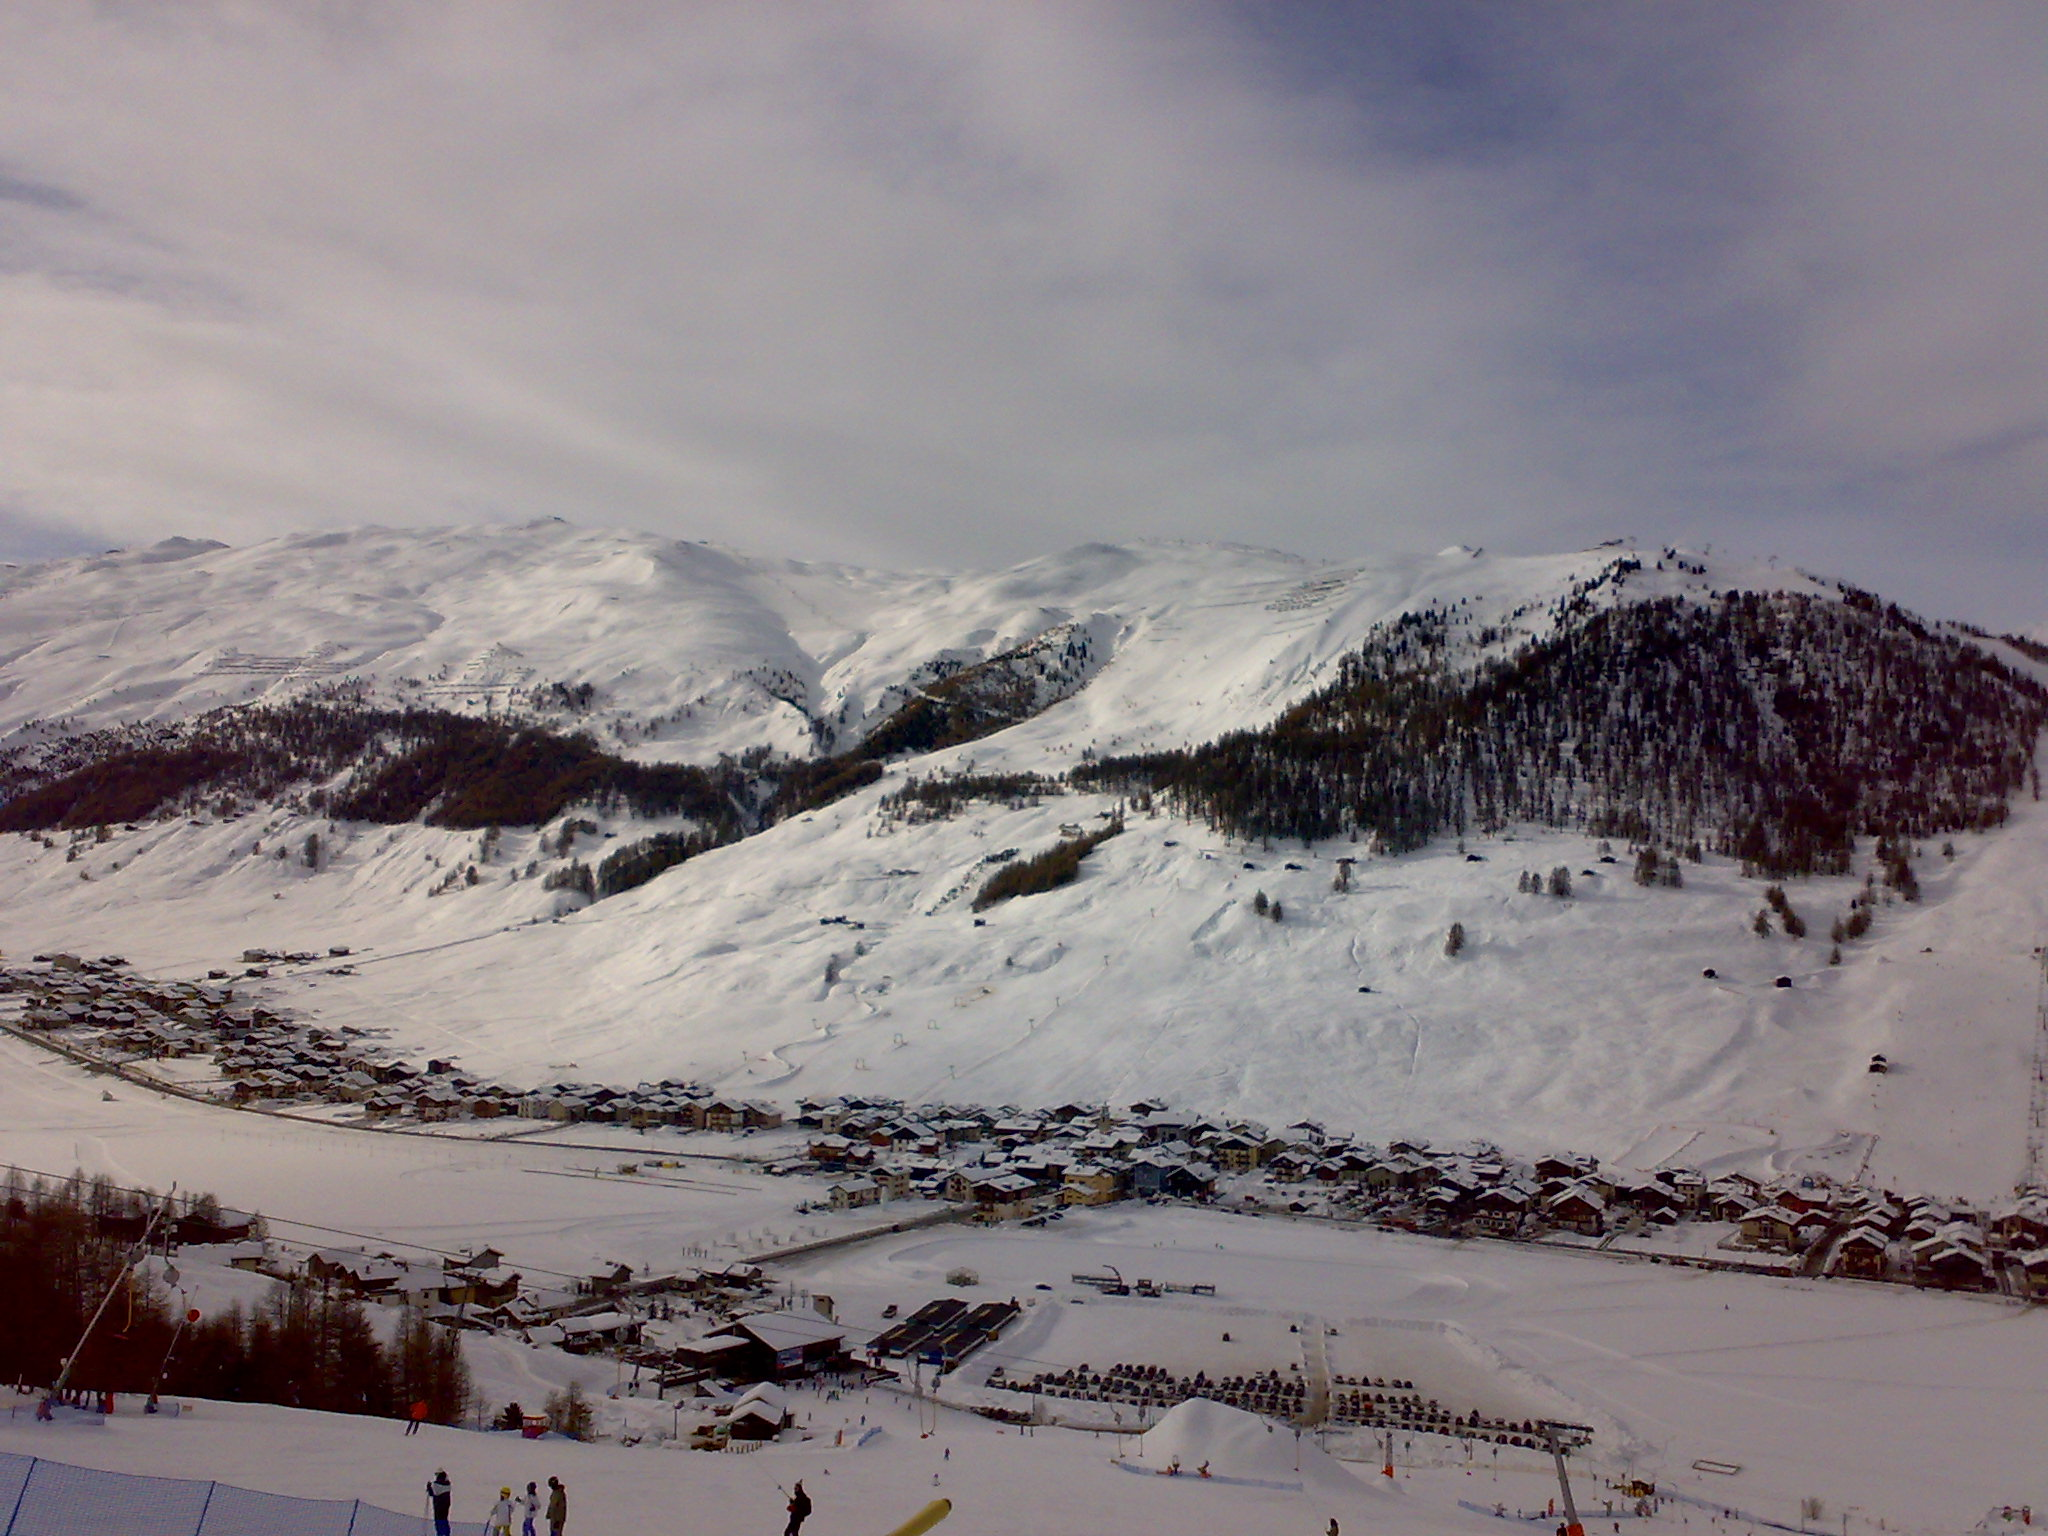 Livigno – View from Mottolino